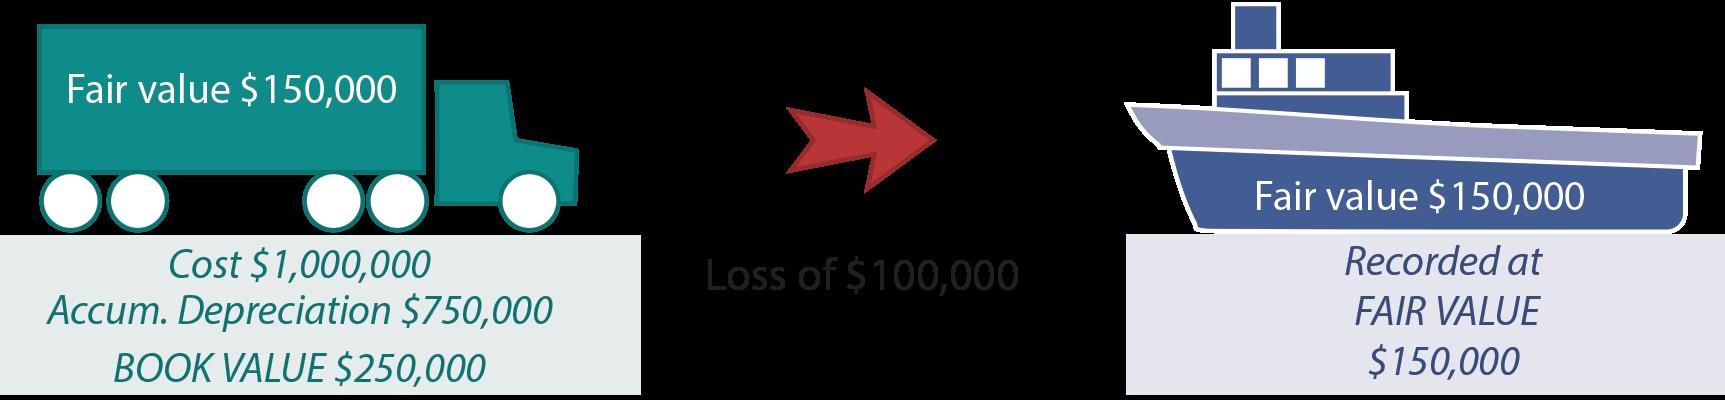 Loss Implied illustration